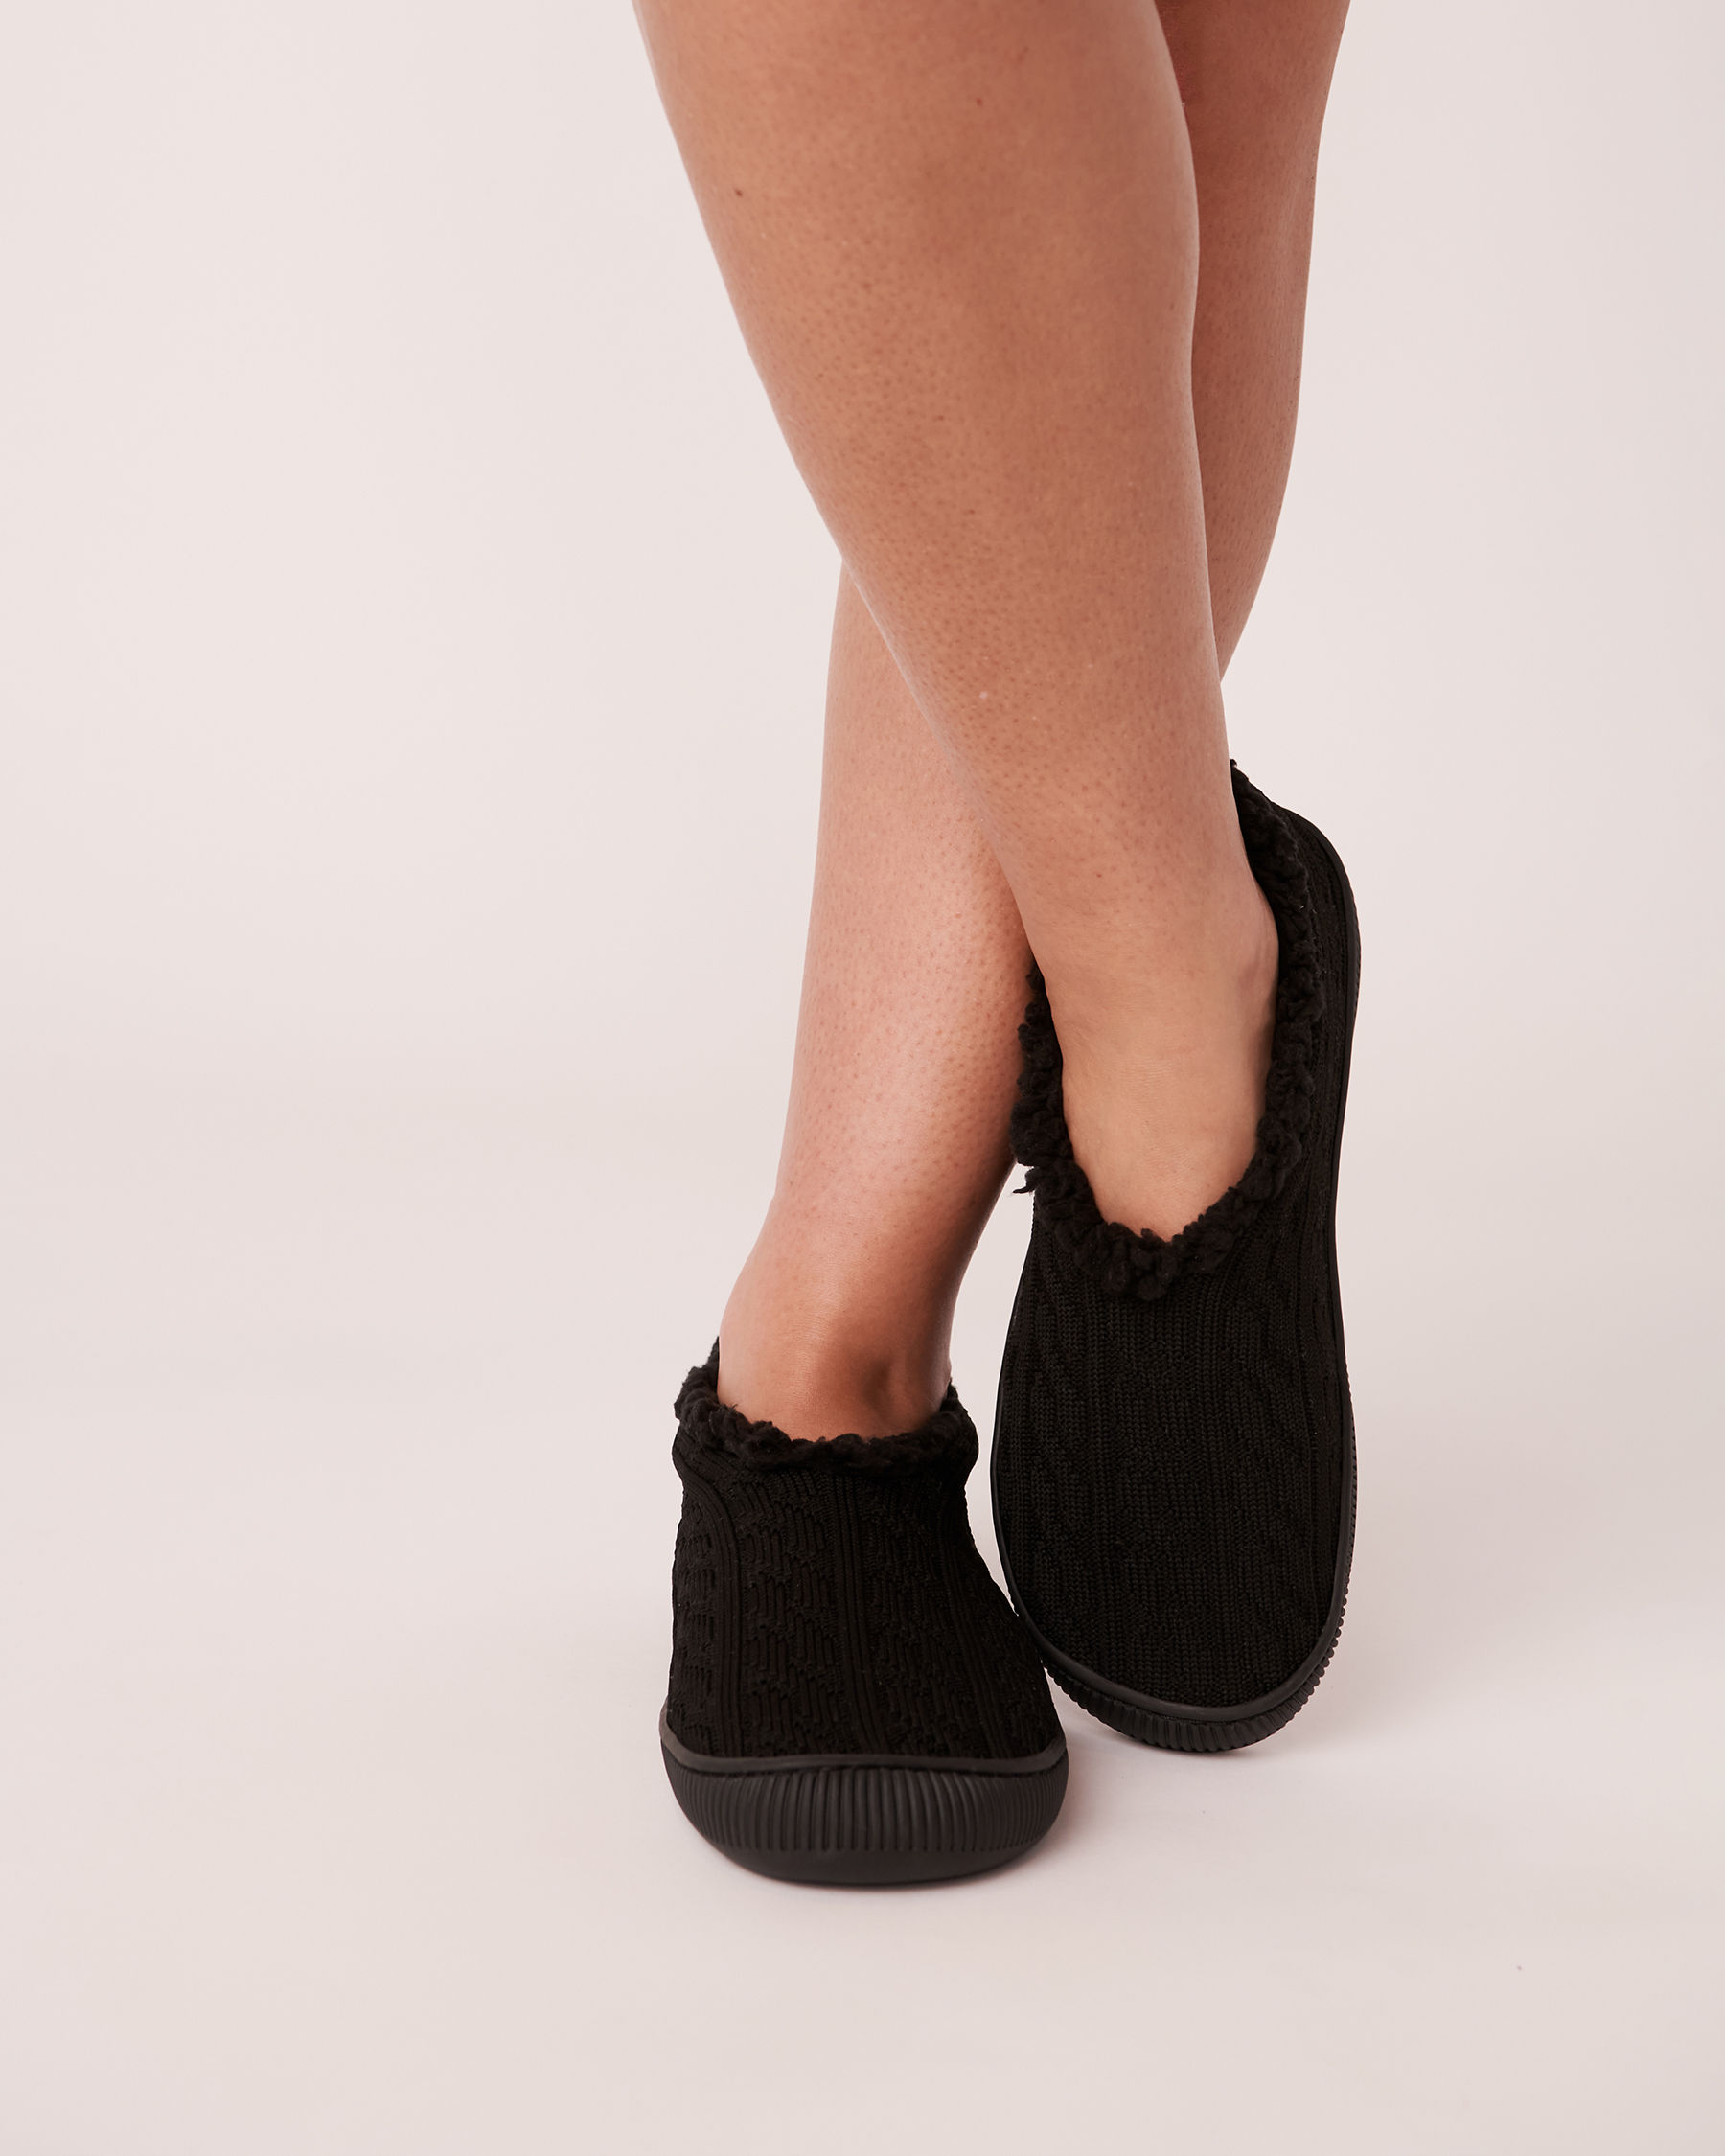 LA VIE EN ROSE Knit Effect Bootie Slippers Black 40700074 - View1